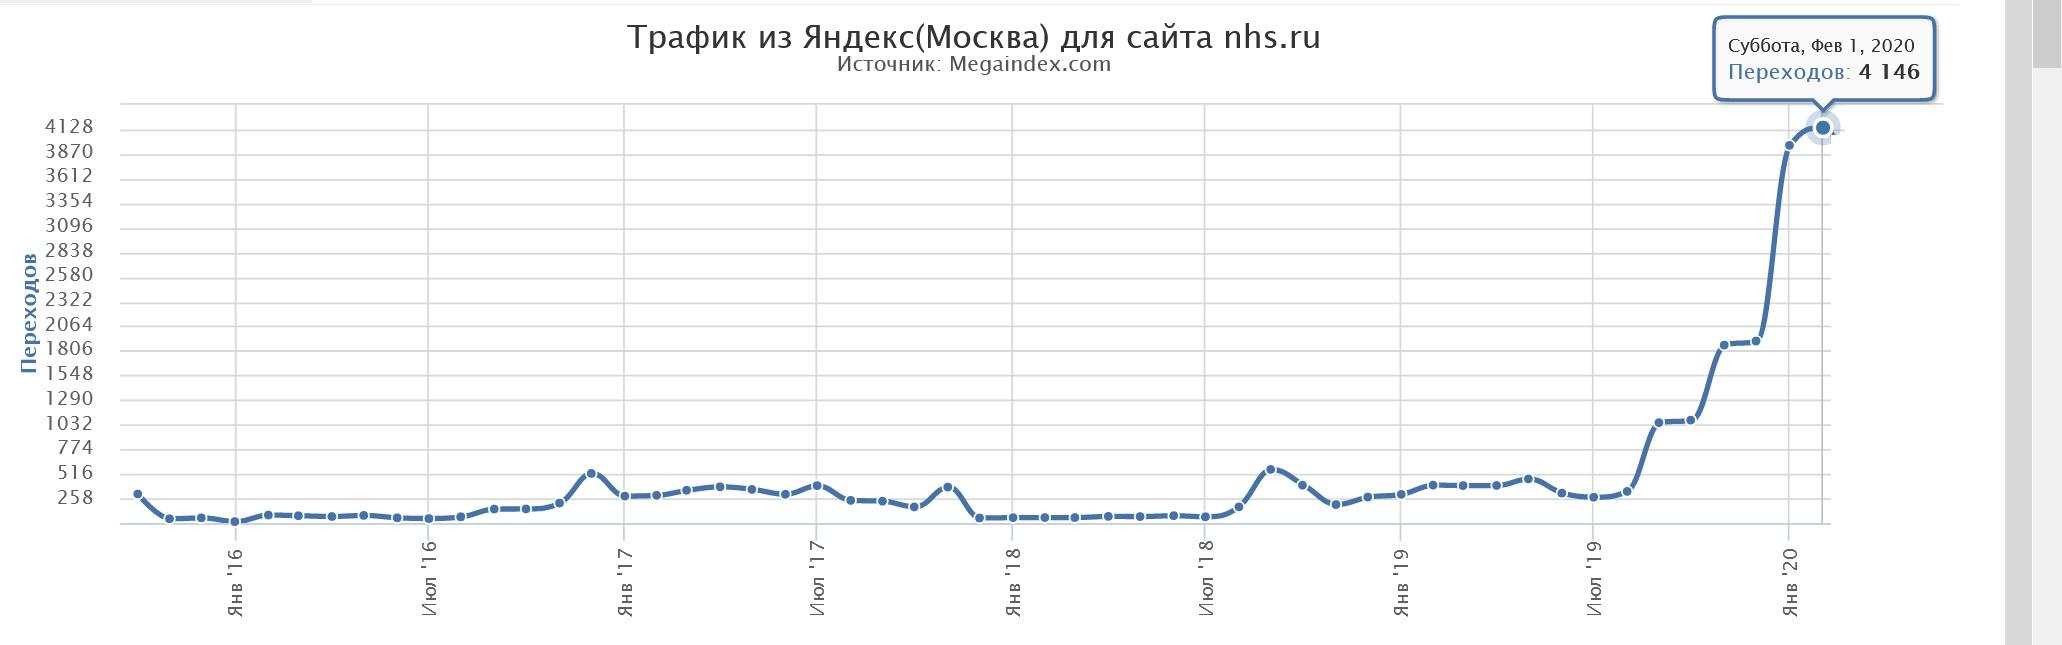 SEO трафик из Яндекс